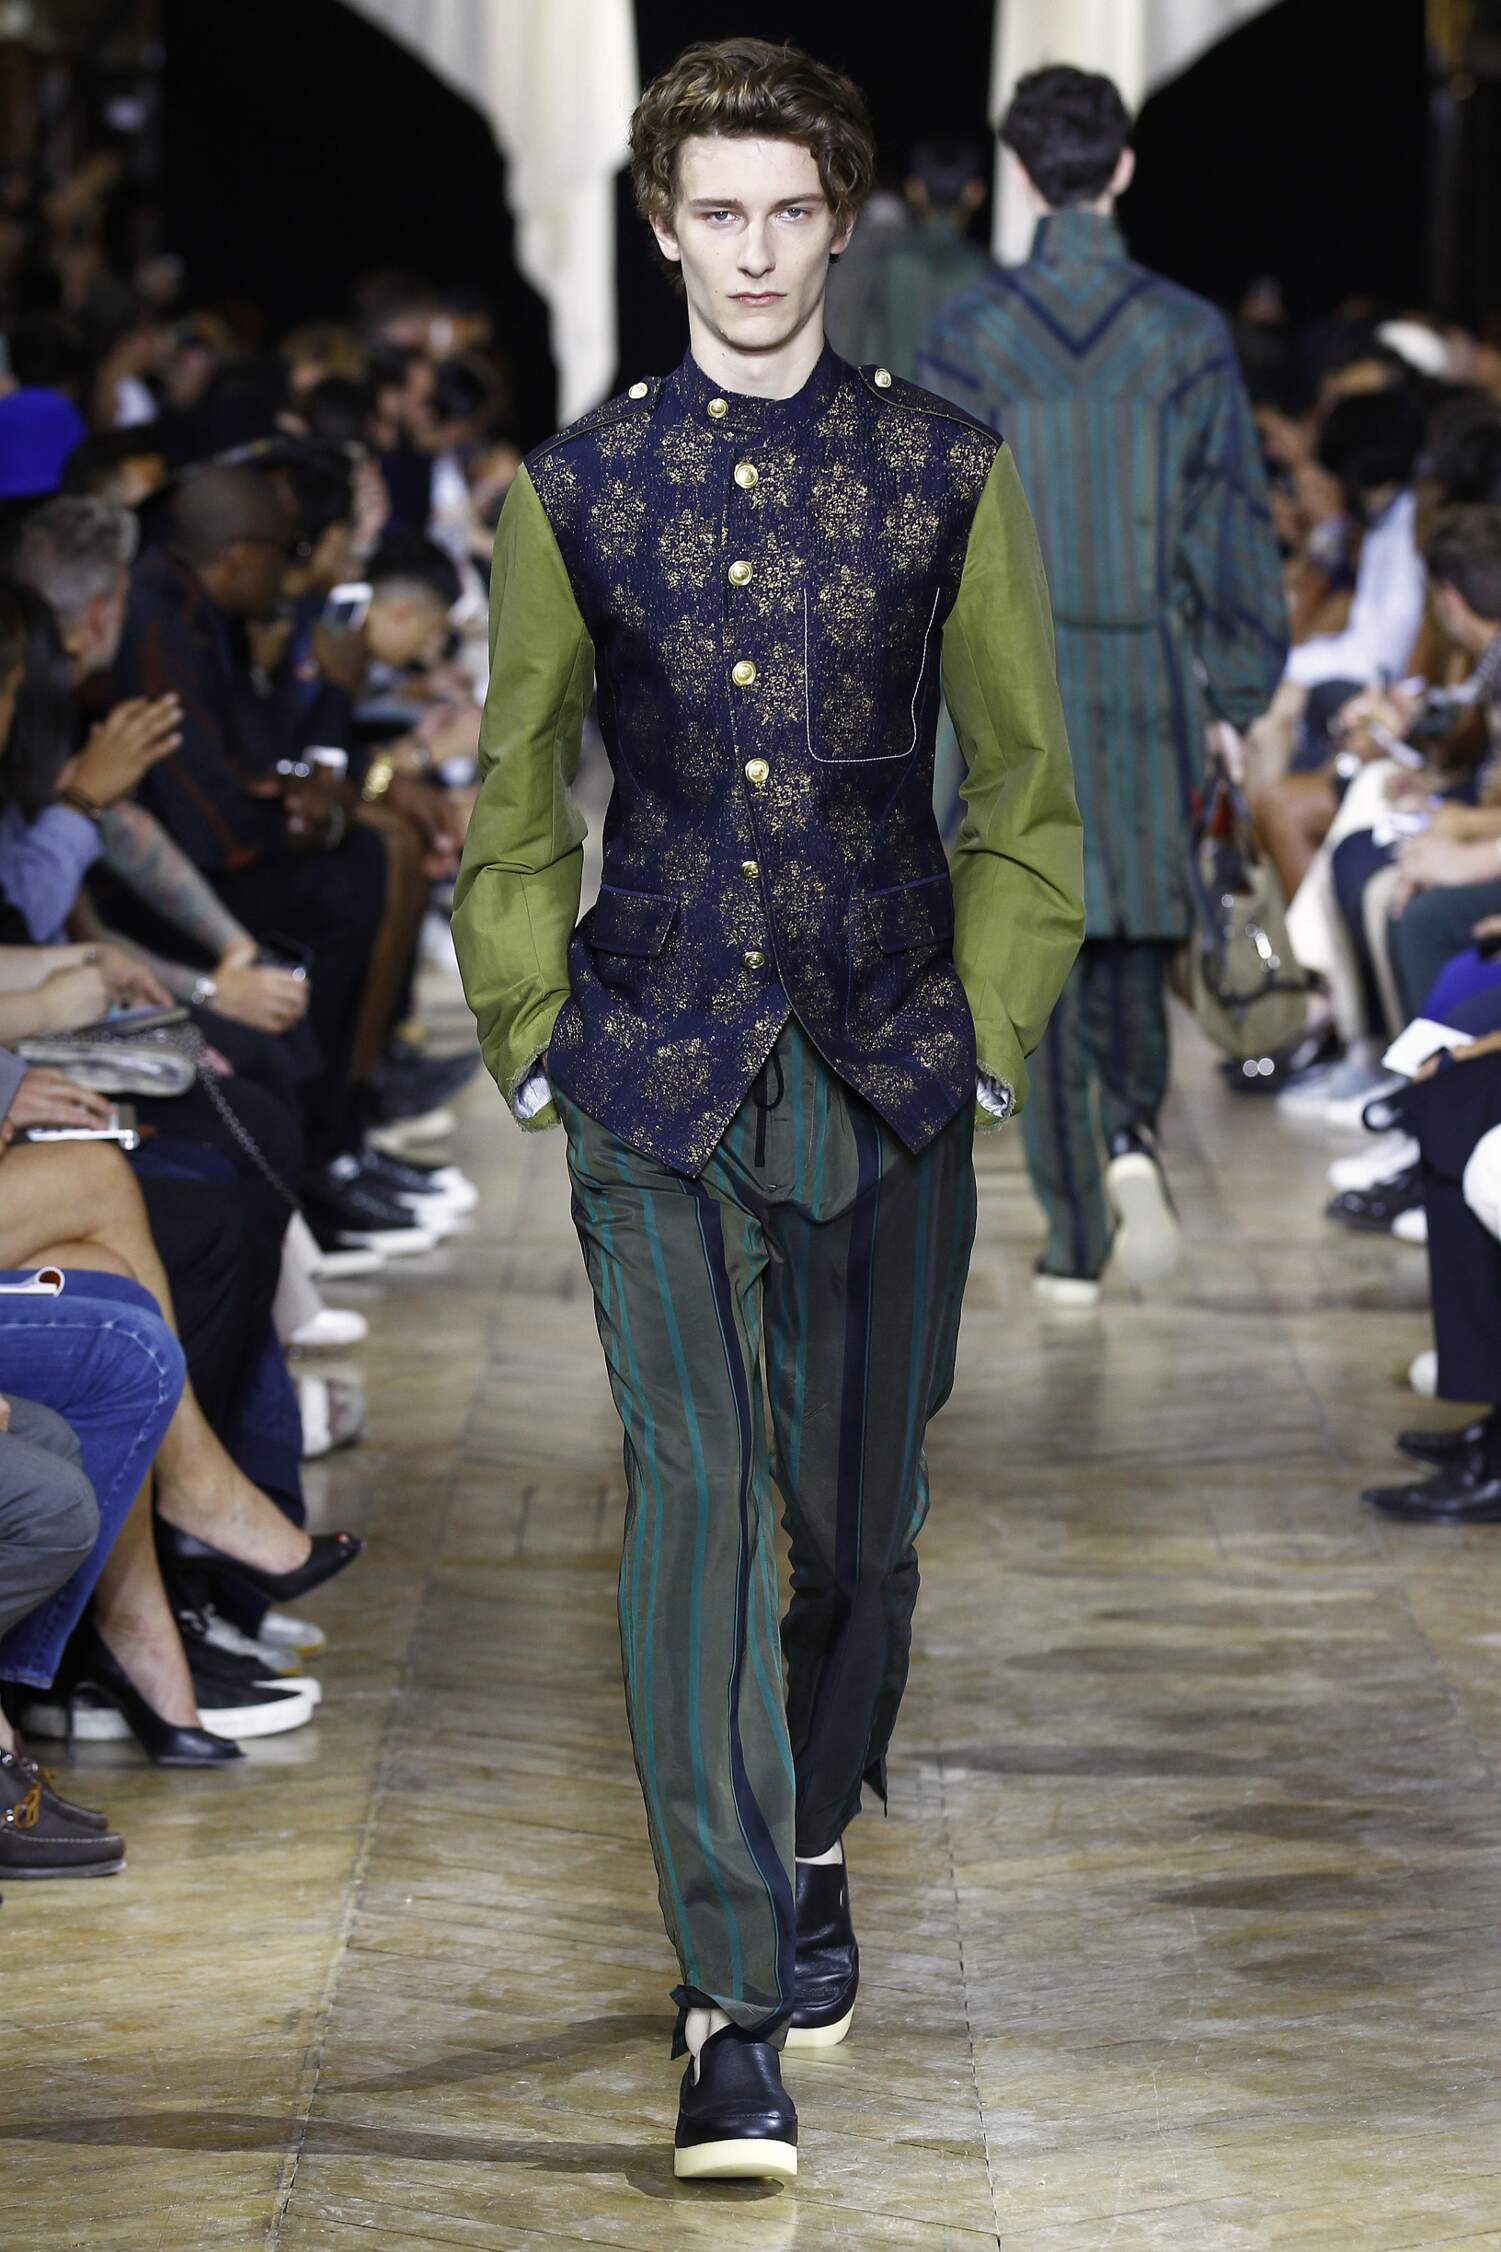 Man Style Phillip Lim